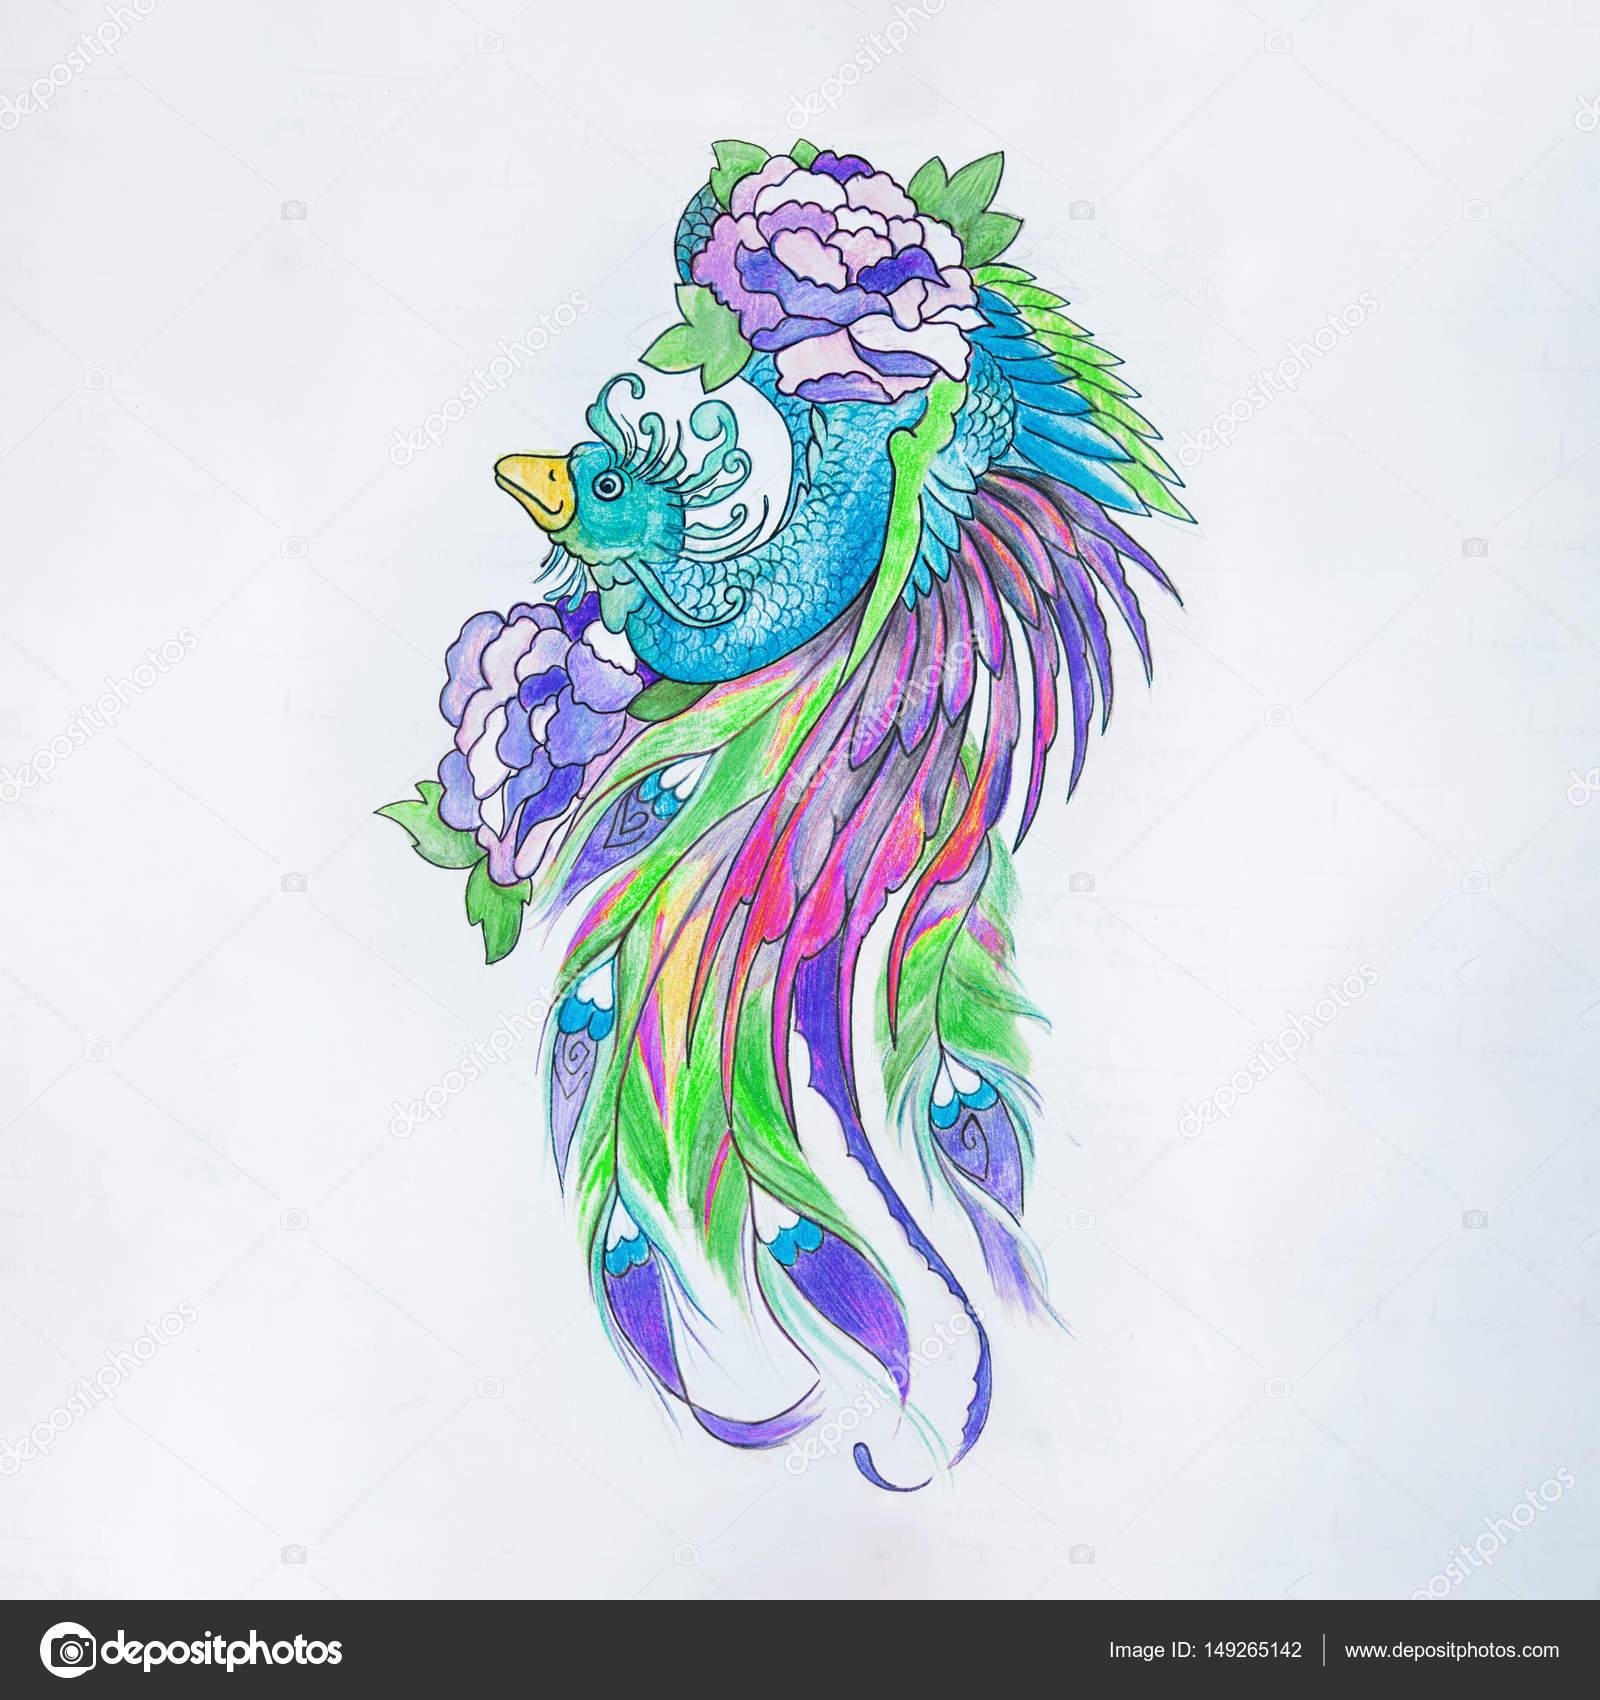 Dibujos Pavos Reales Pintados Dibujo De Pavo Real Hermoso Sobre